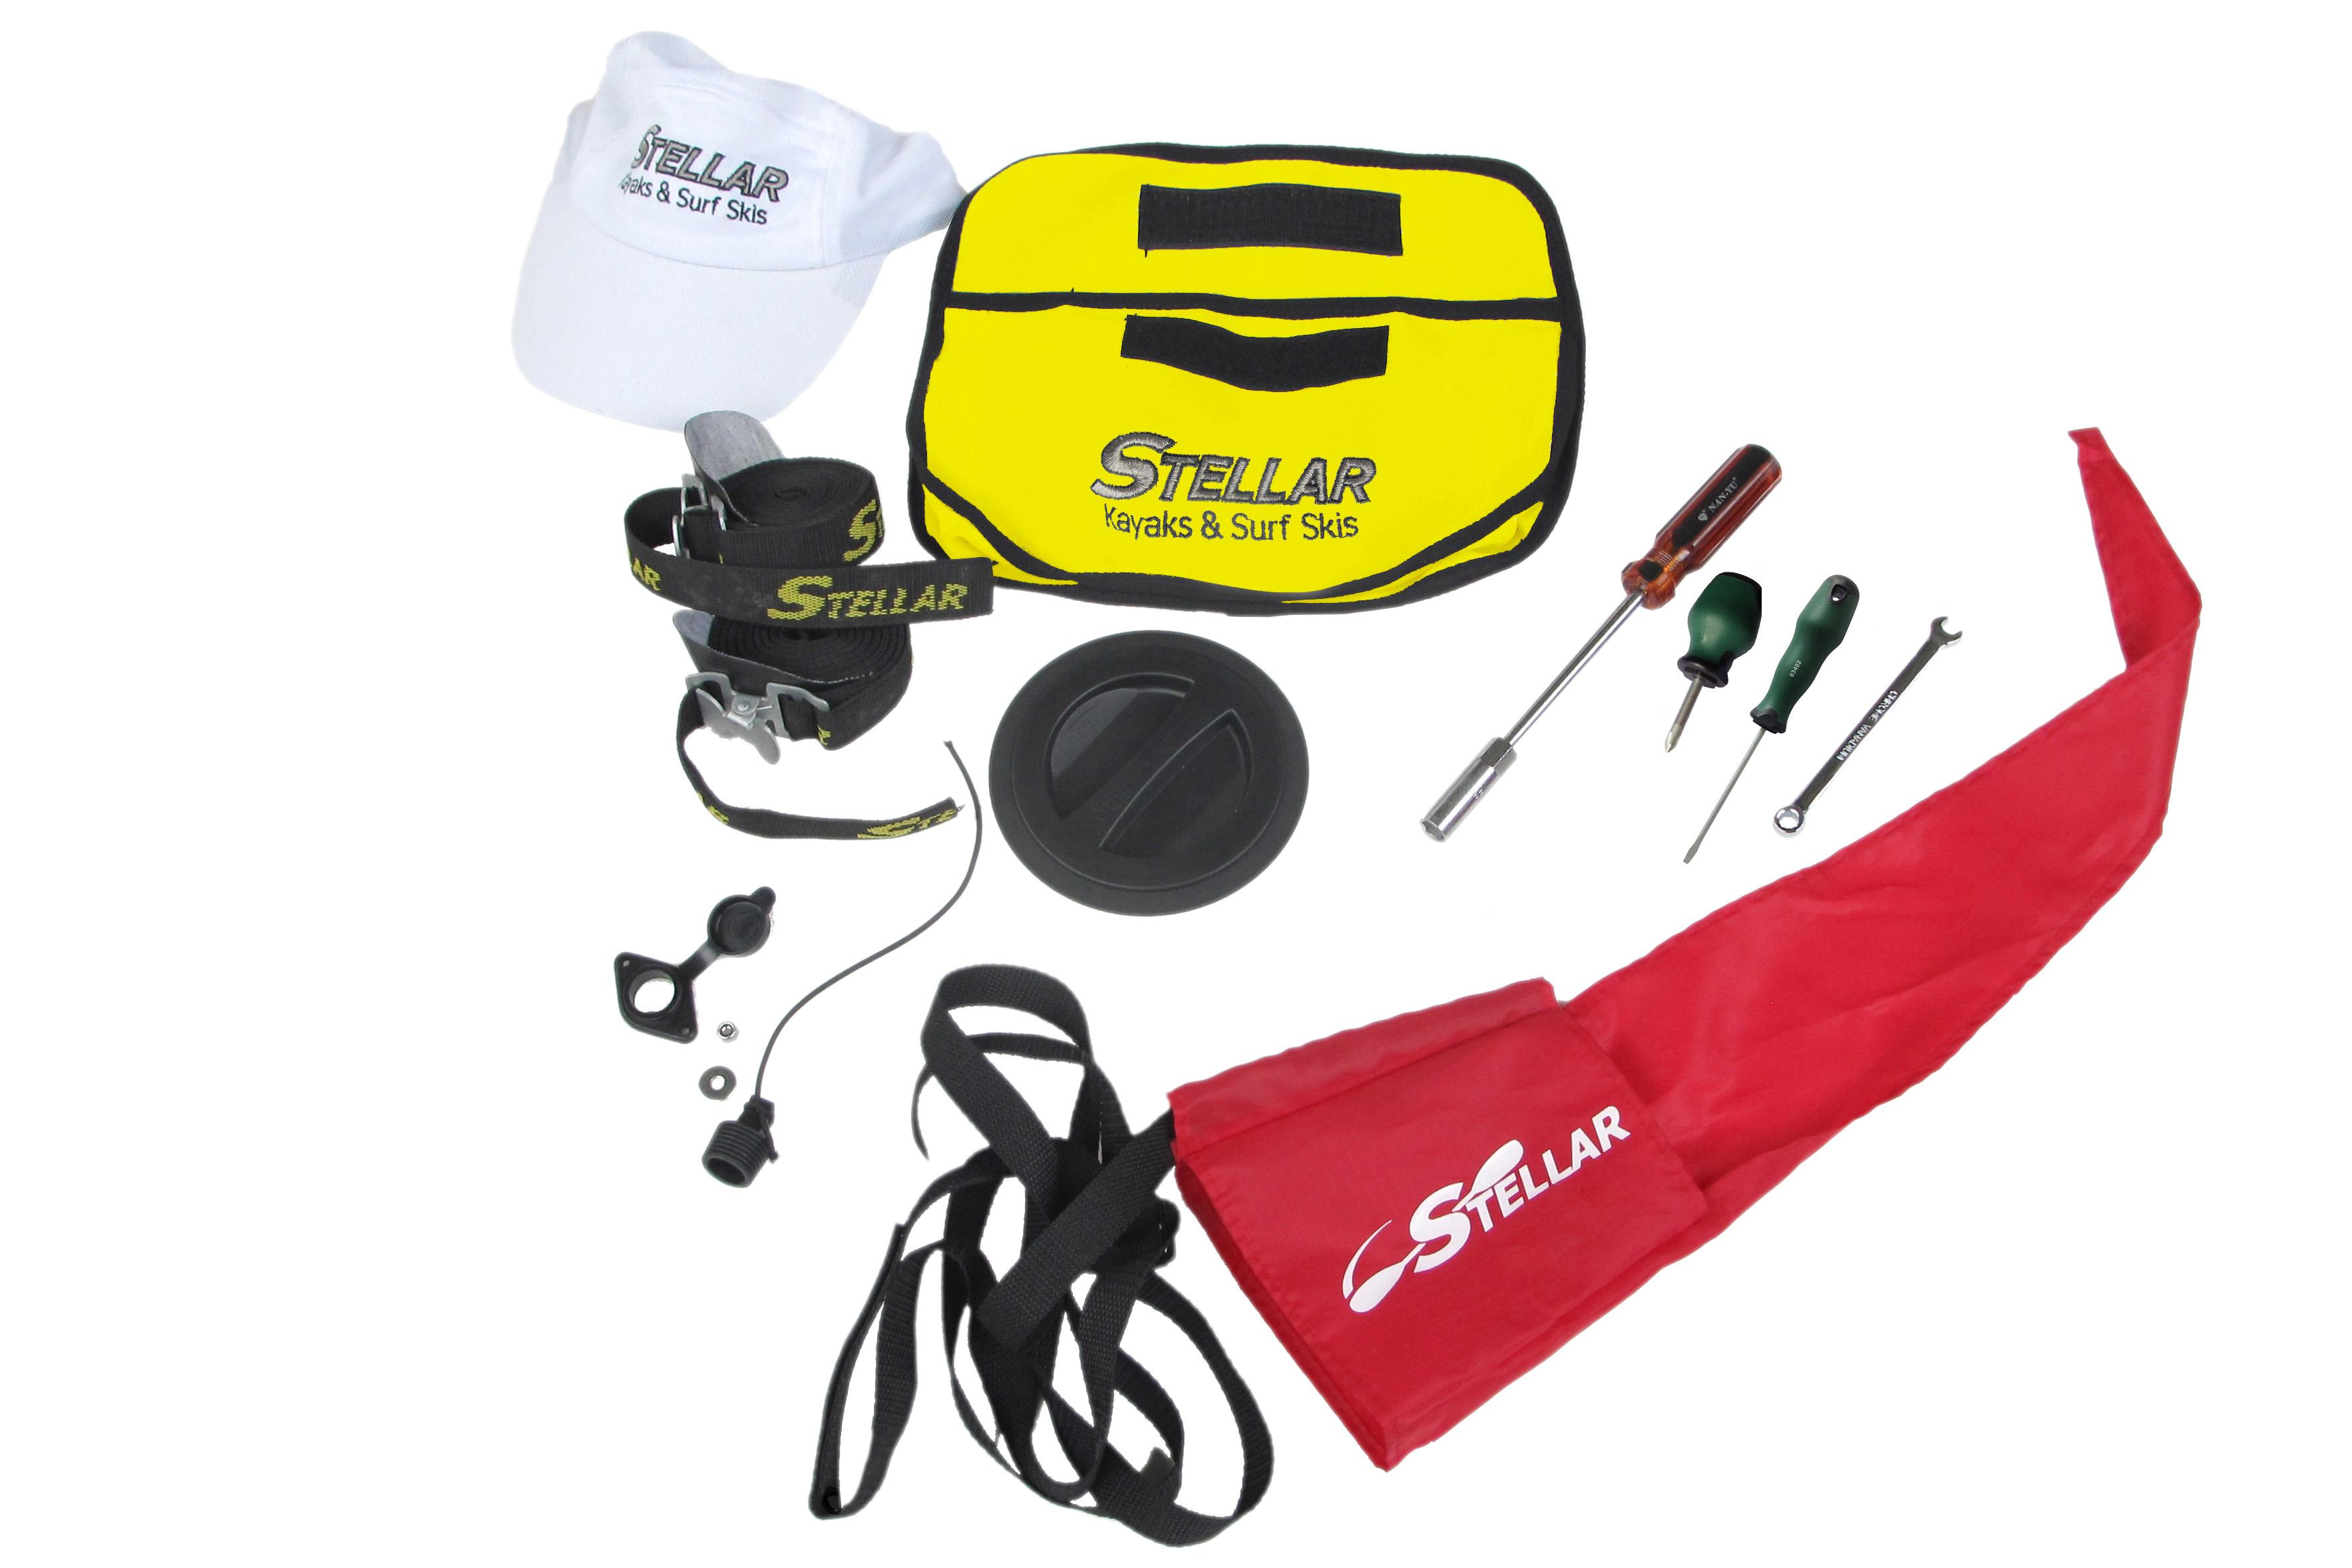 Ski Spare Parts Bag